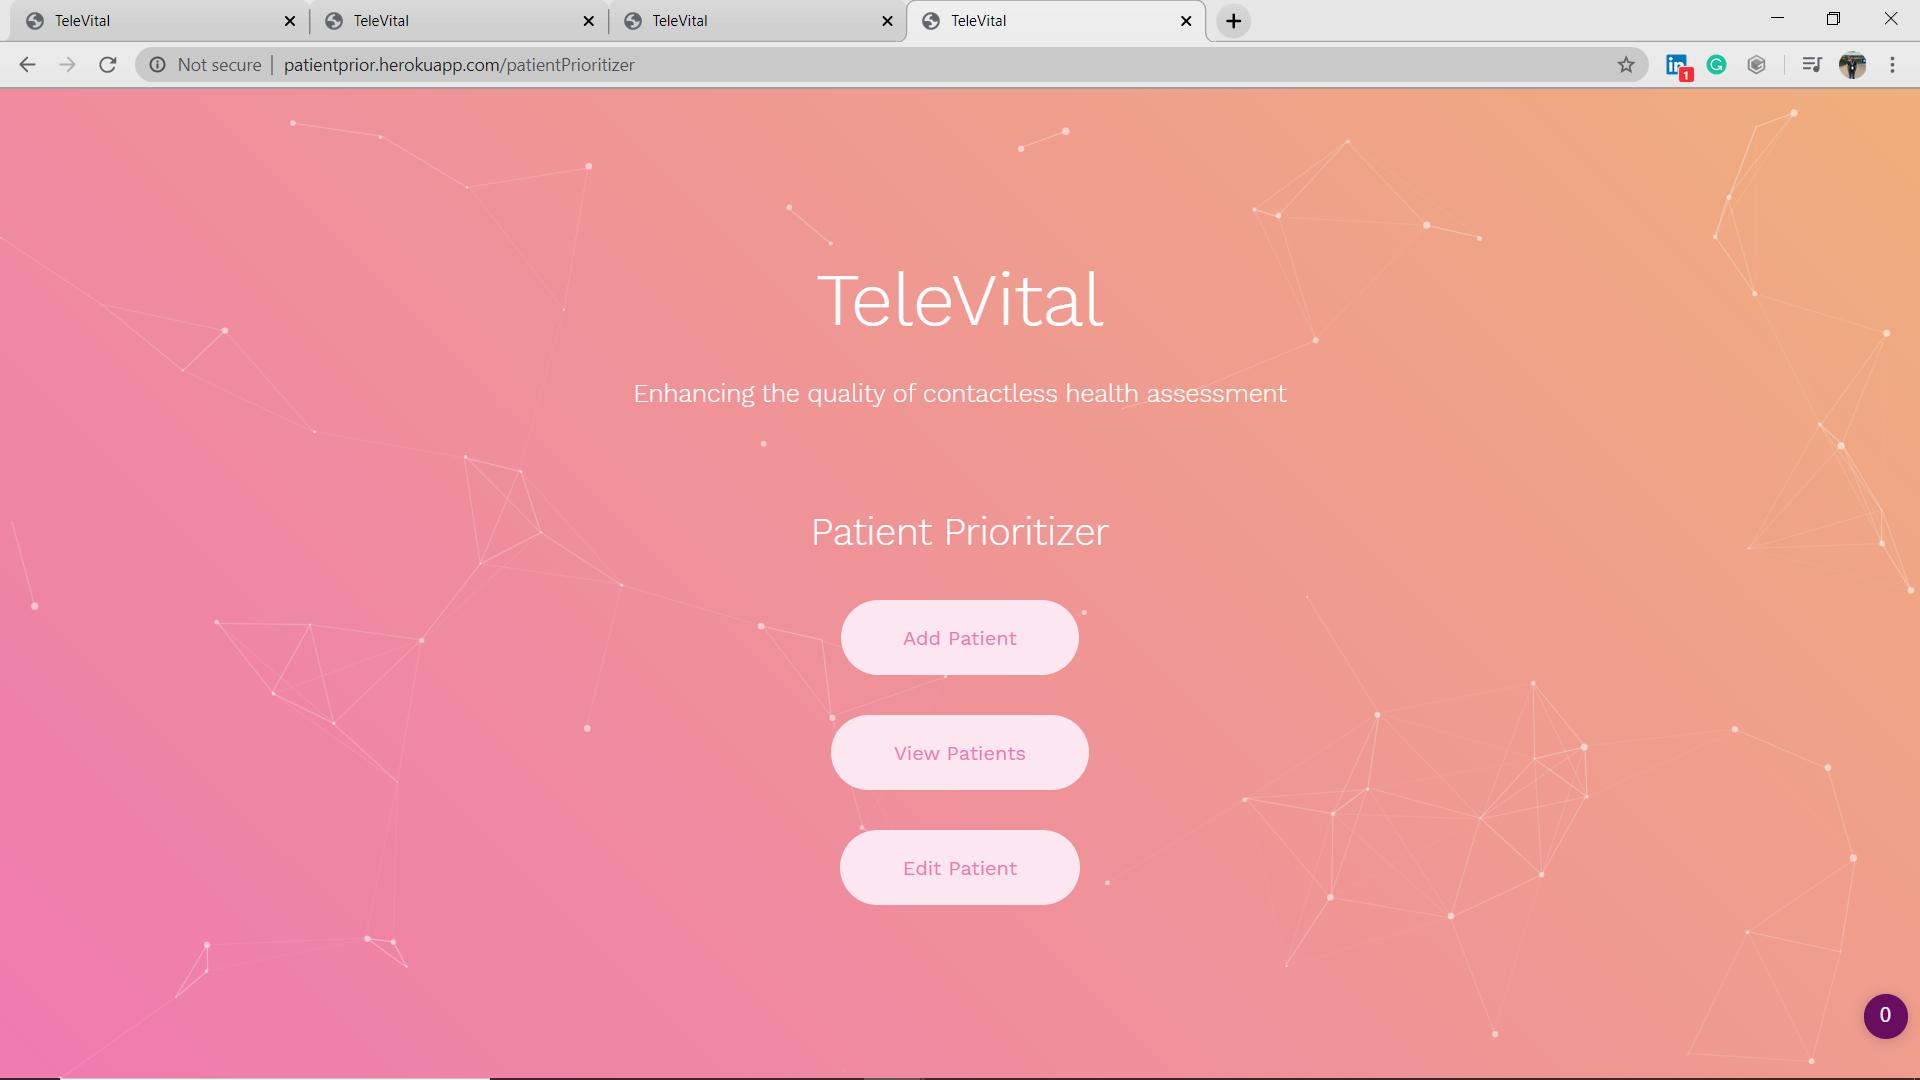 TeleVital